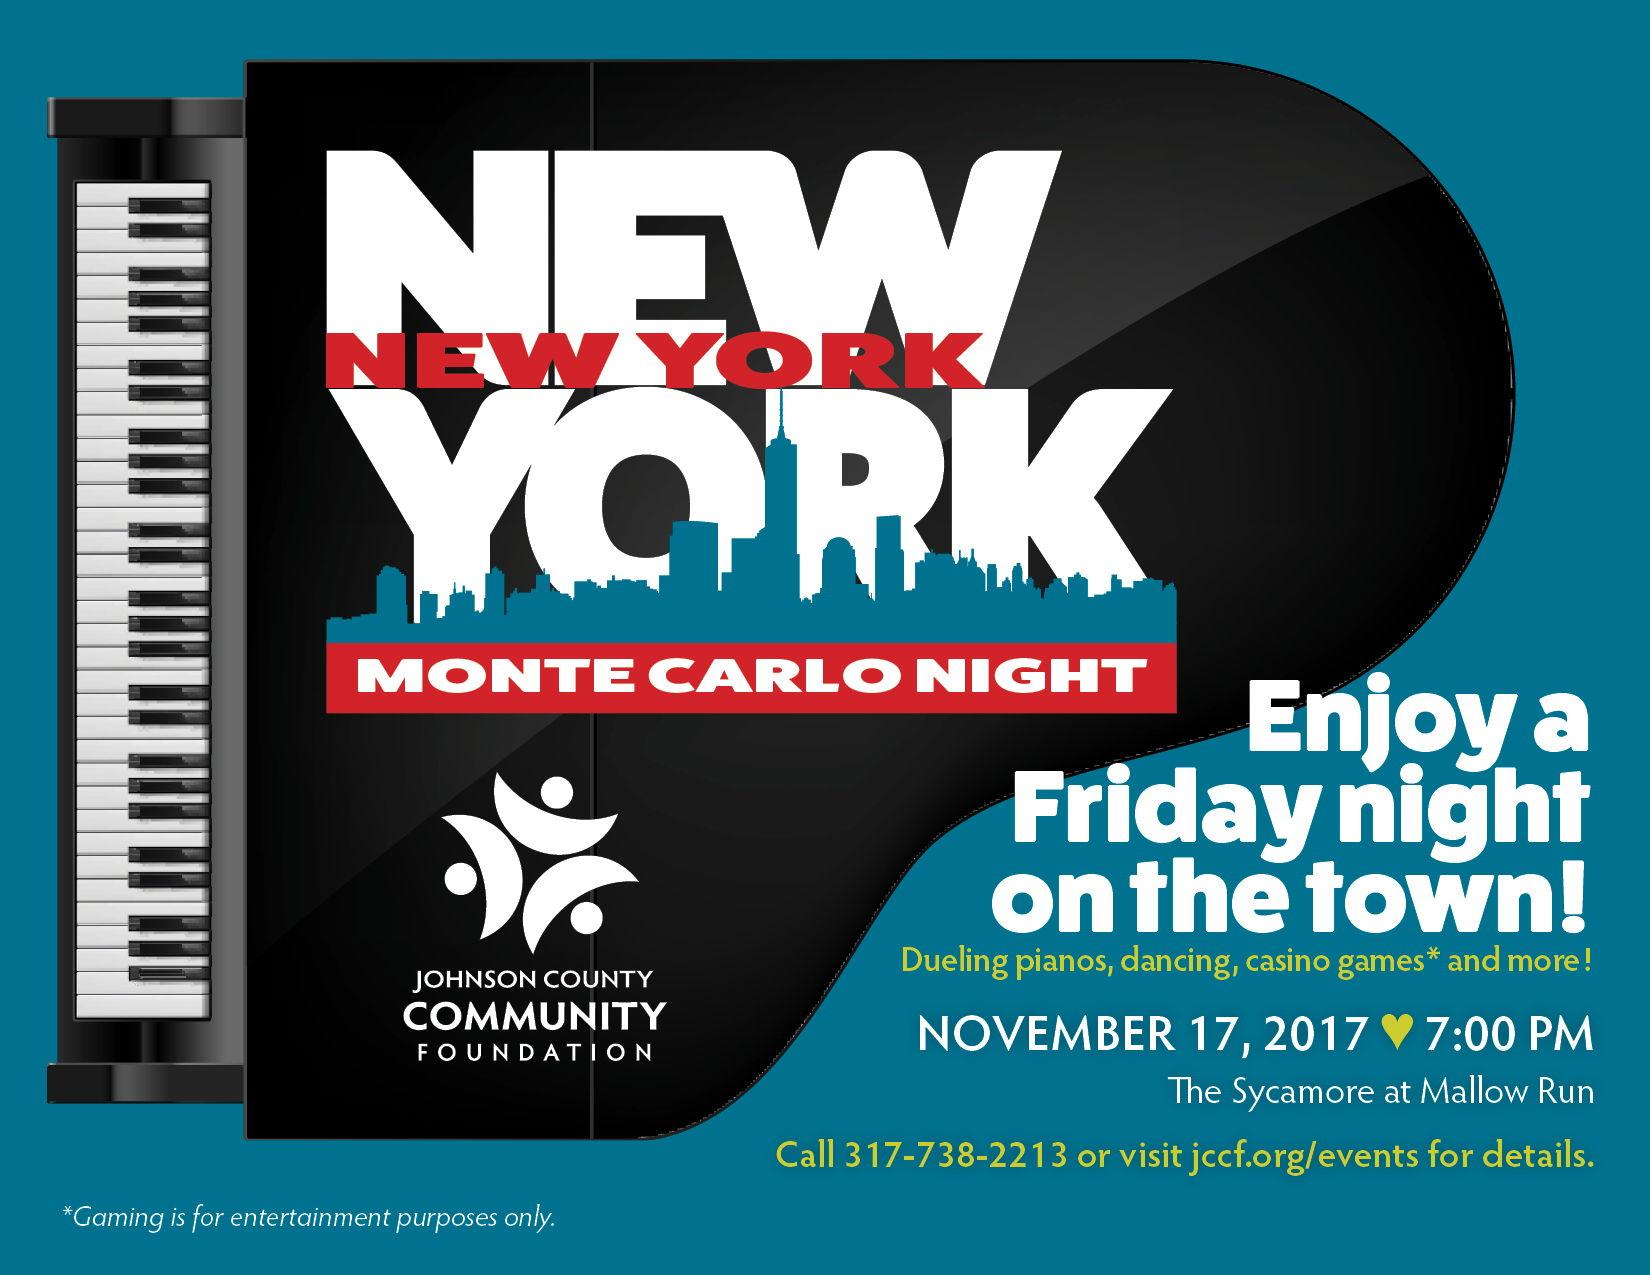 New York New York Monte Carlo Night 2017